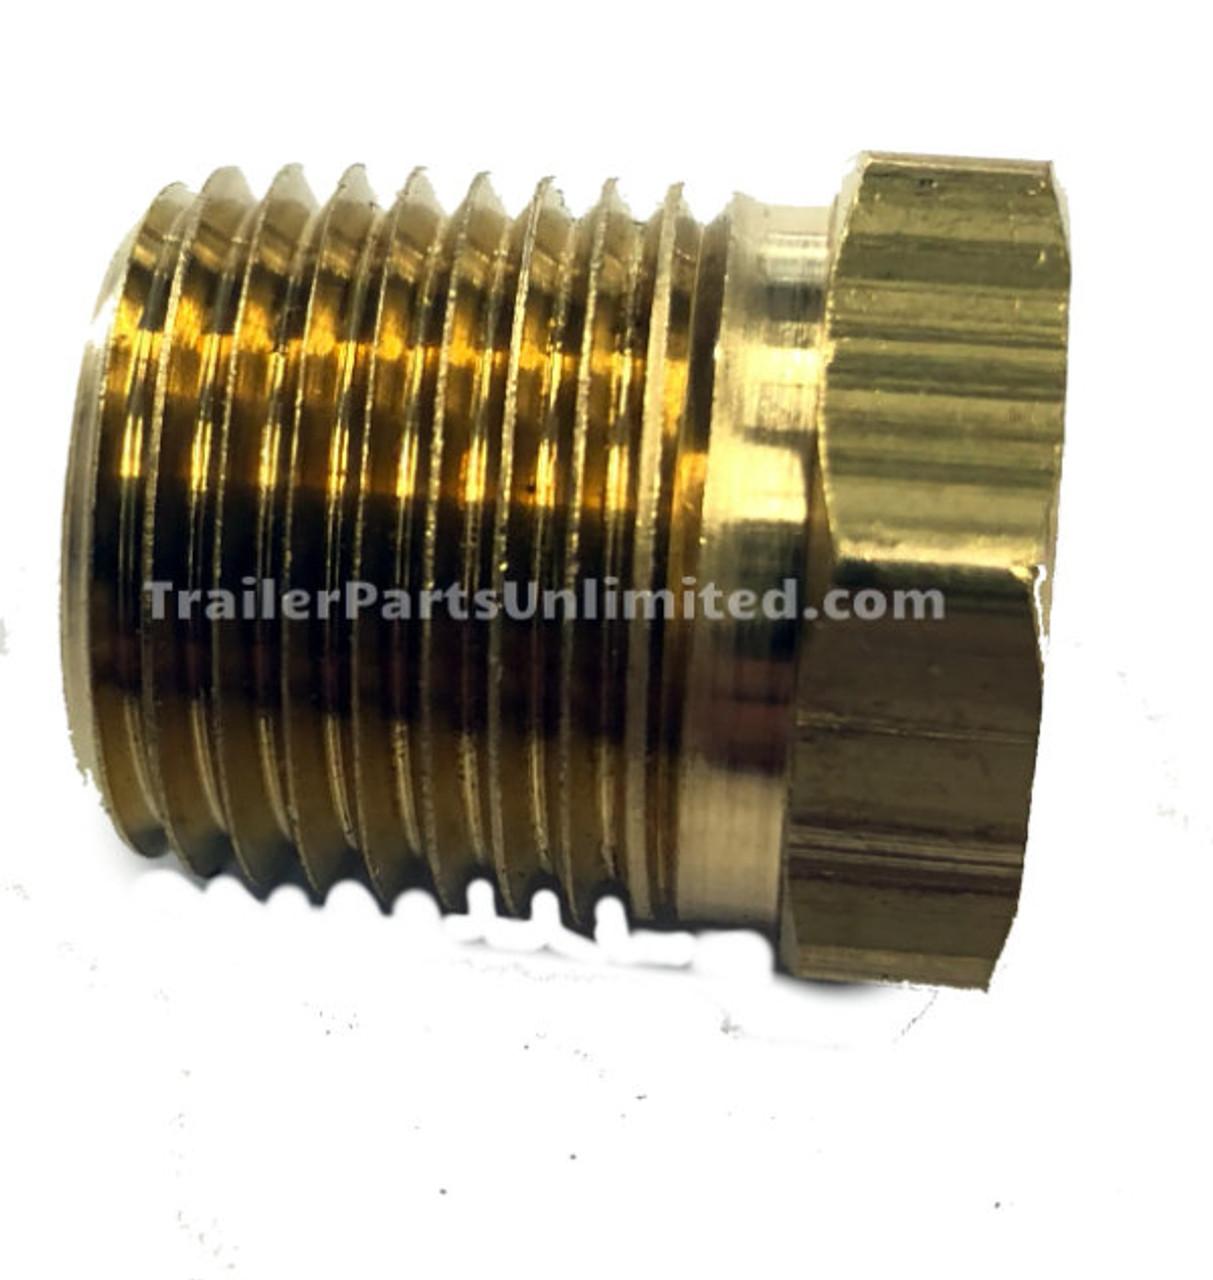 "Brass Reducer Bushing 1/2"" x 3/8"""